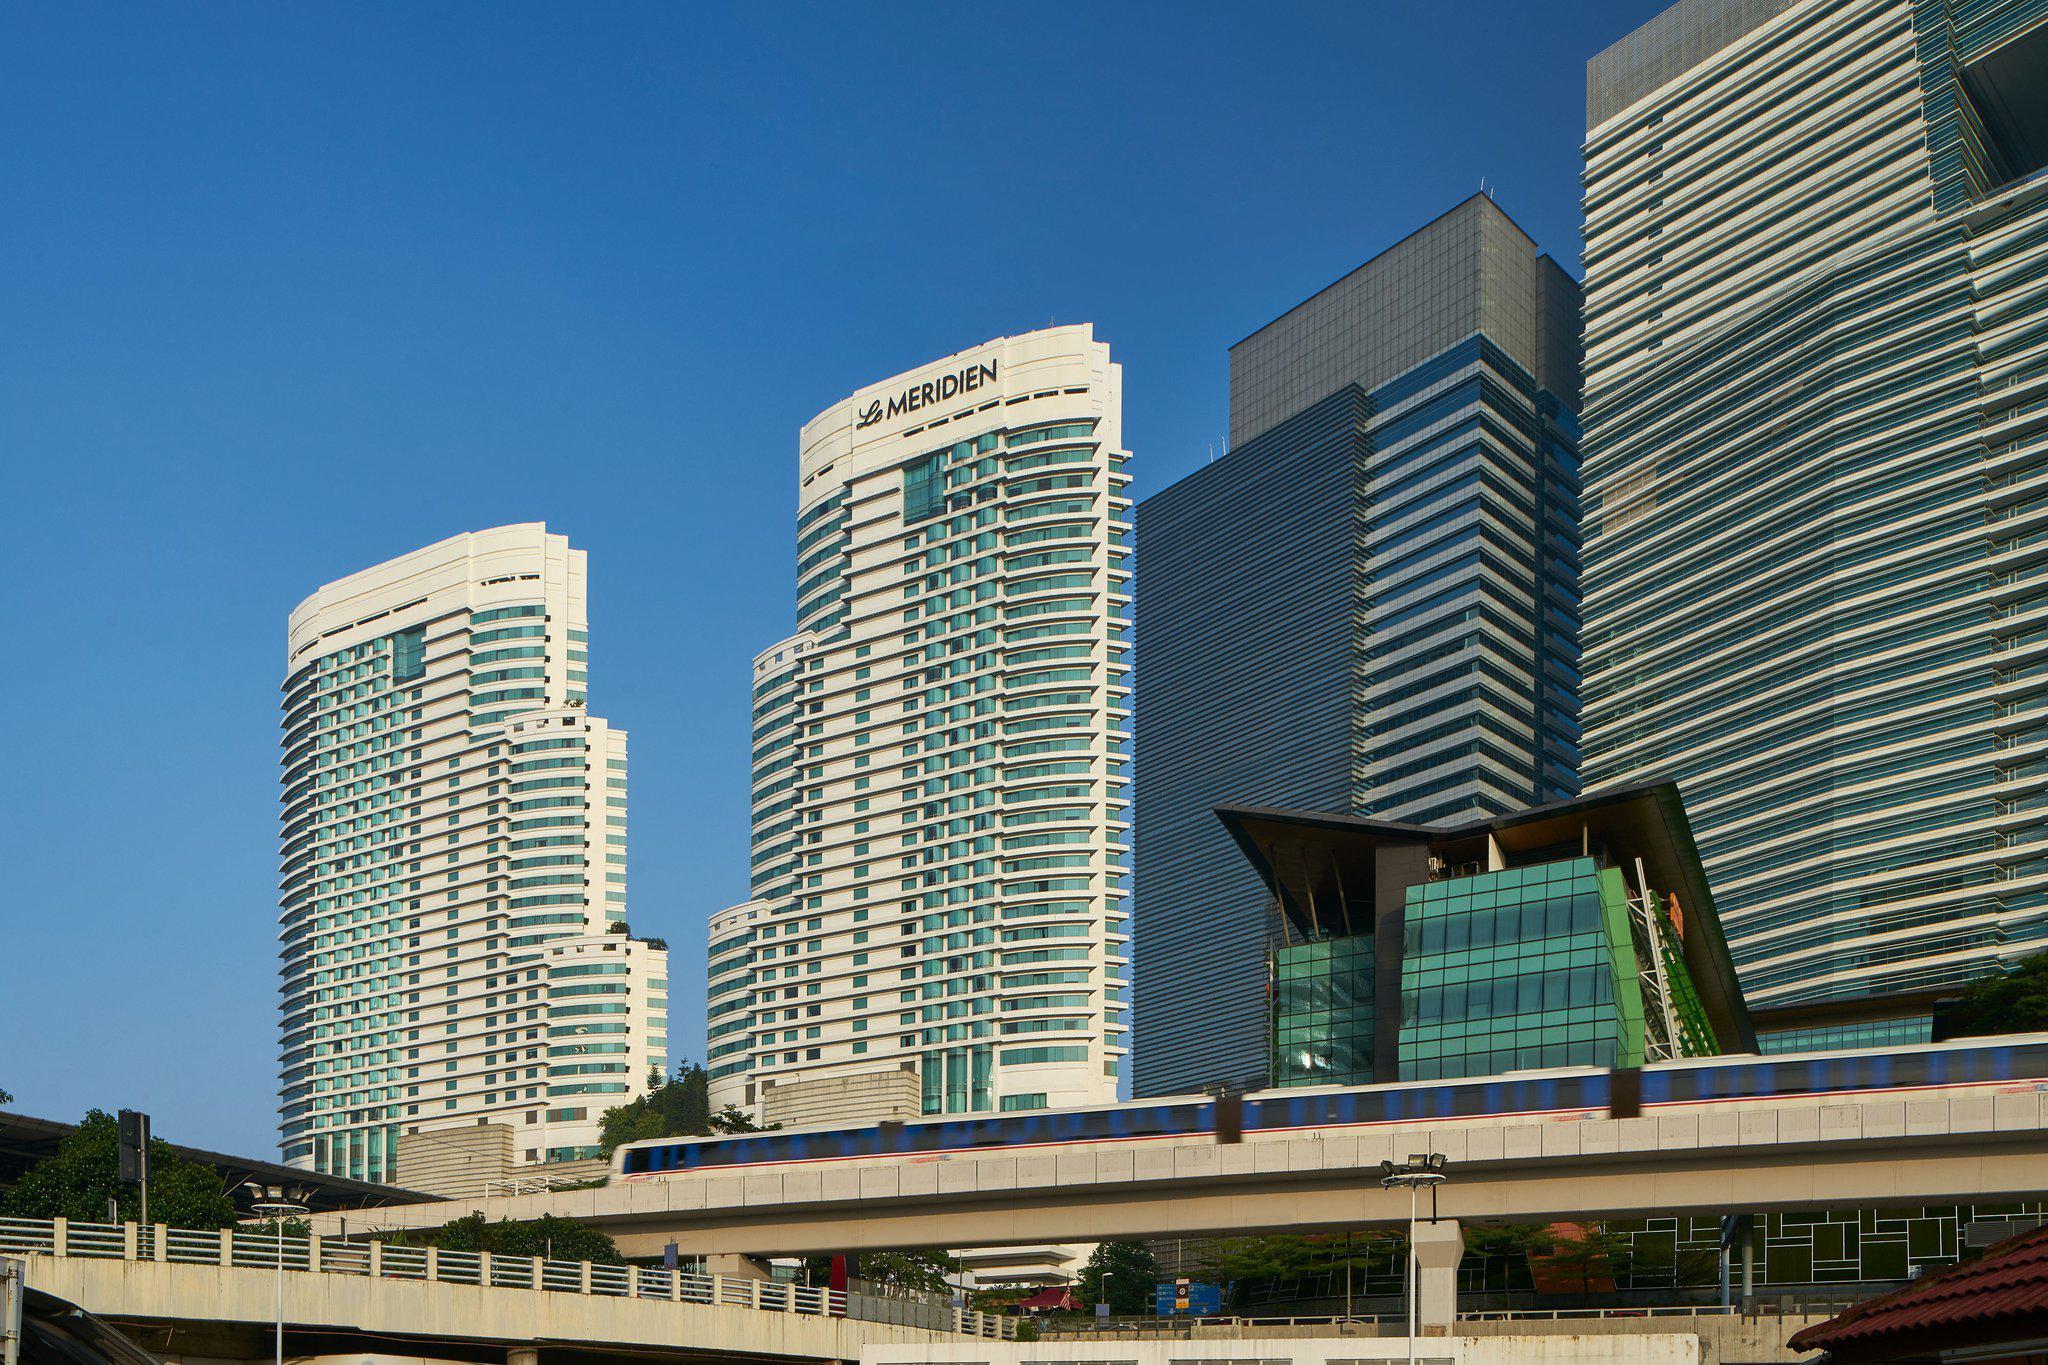 Le Méridien Kuala Lumpur